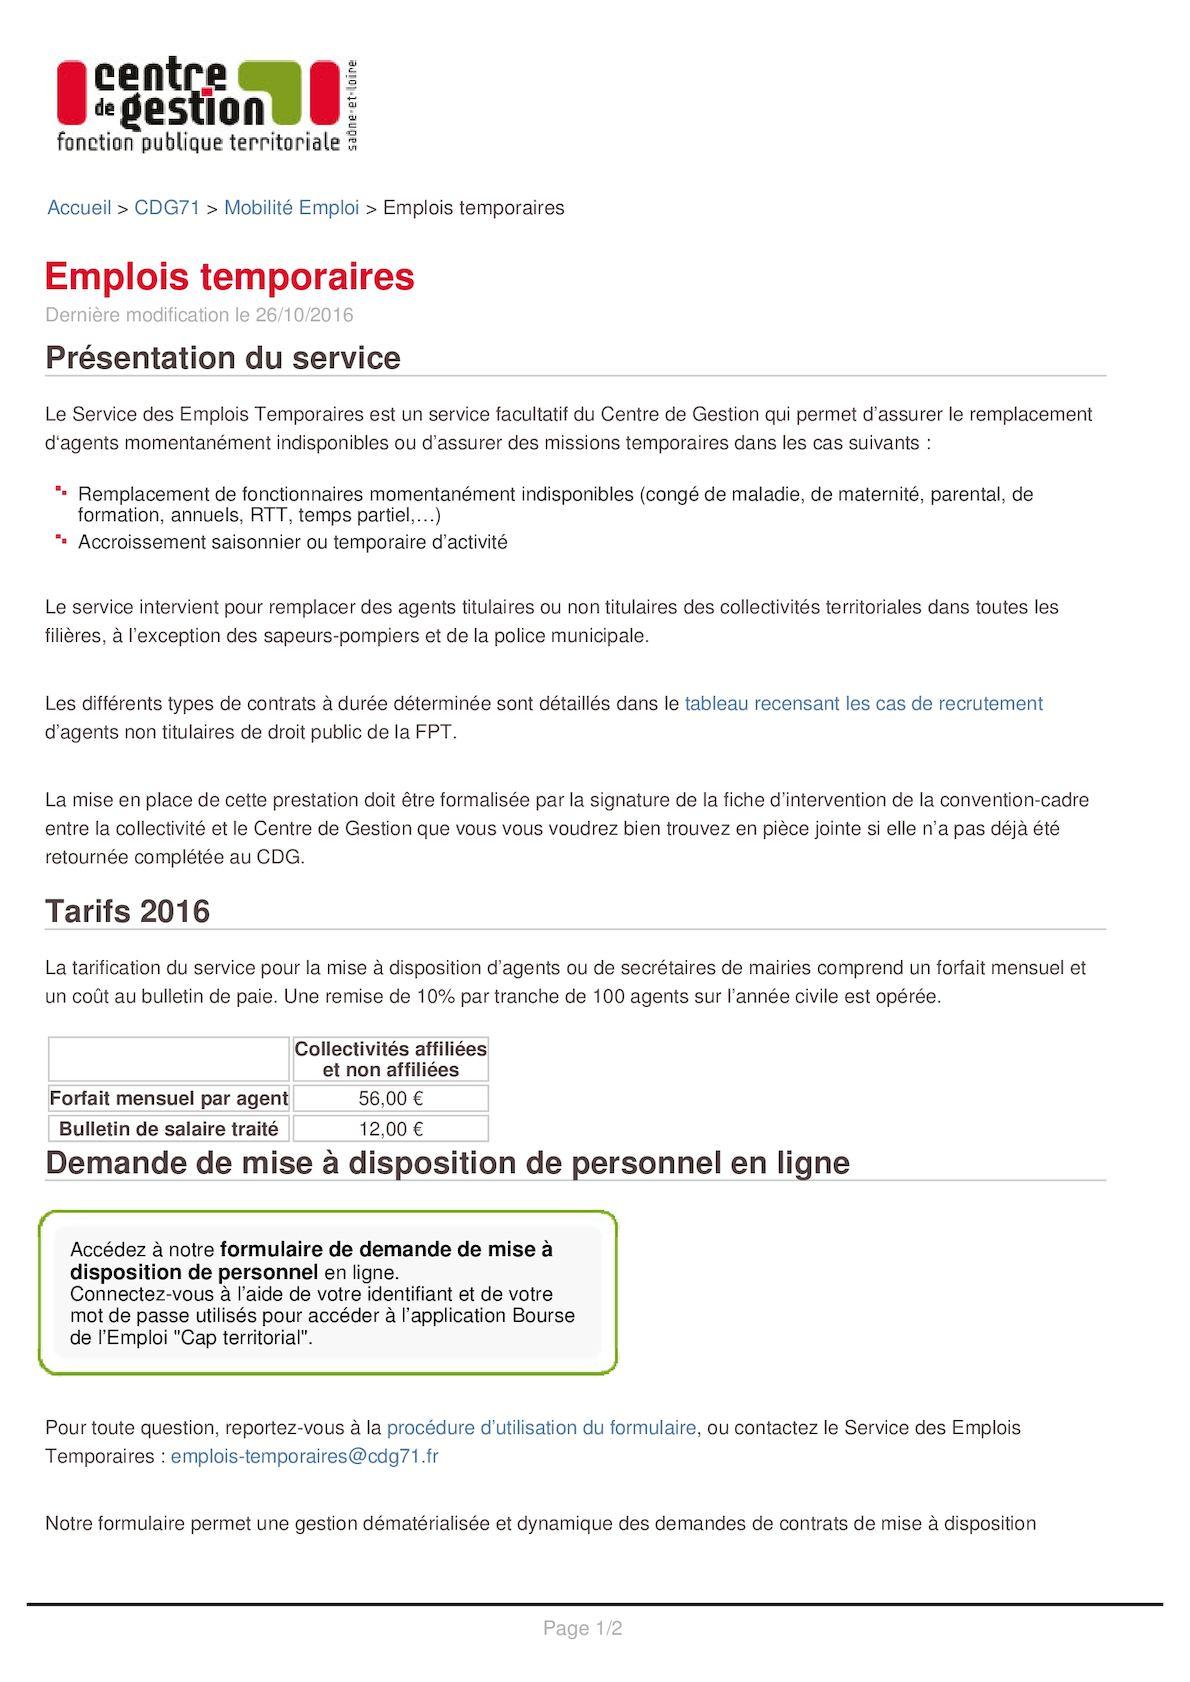 91ee593af64 Calaméo - 35 Emplois Temporaires